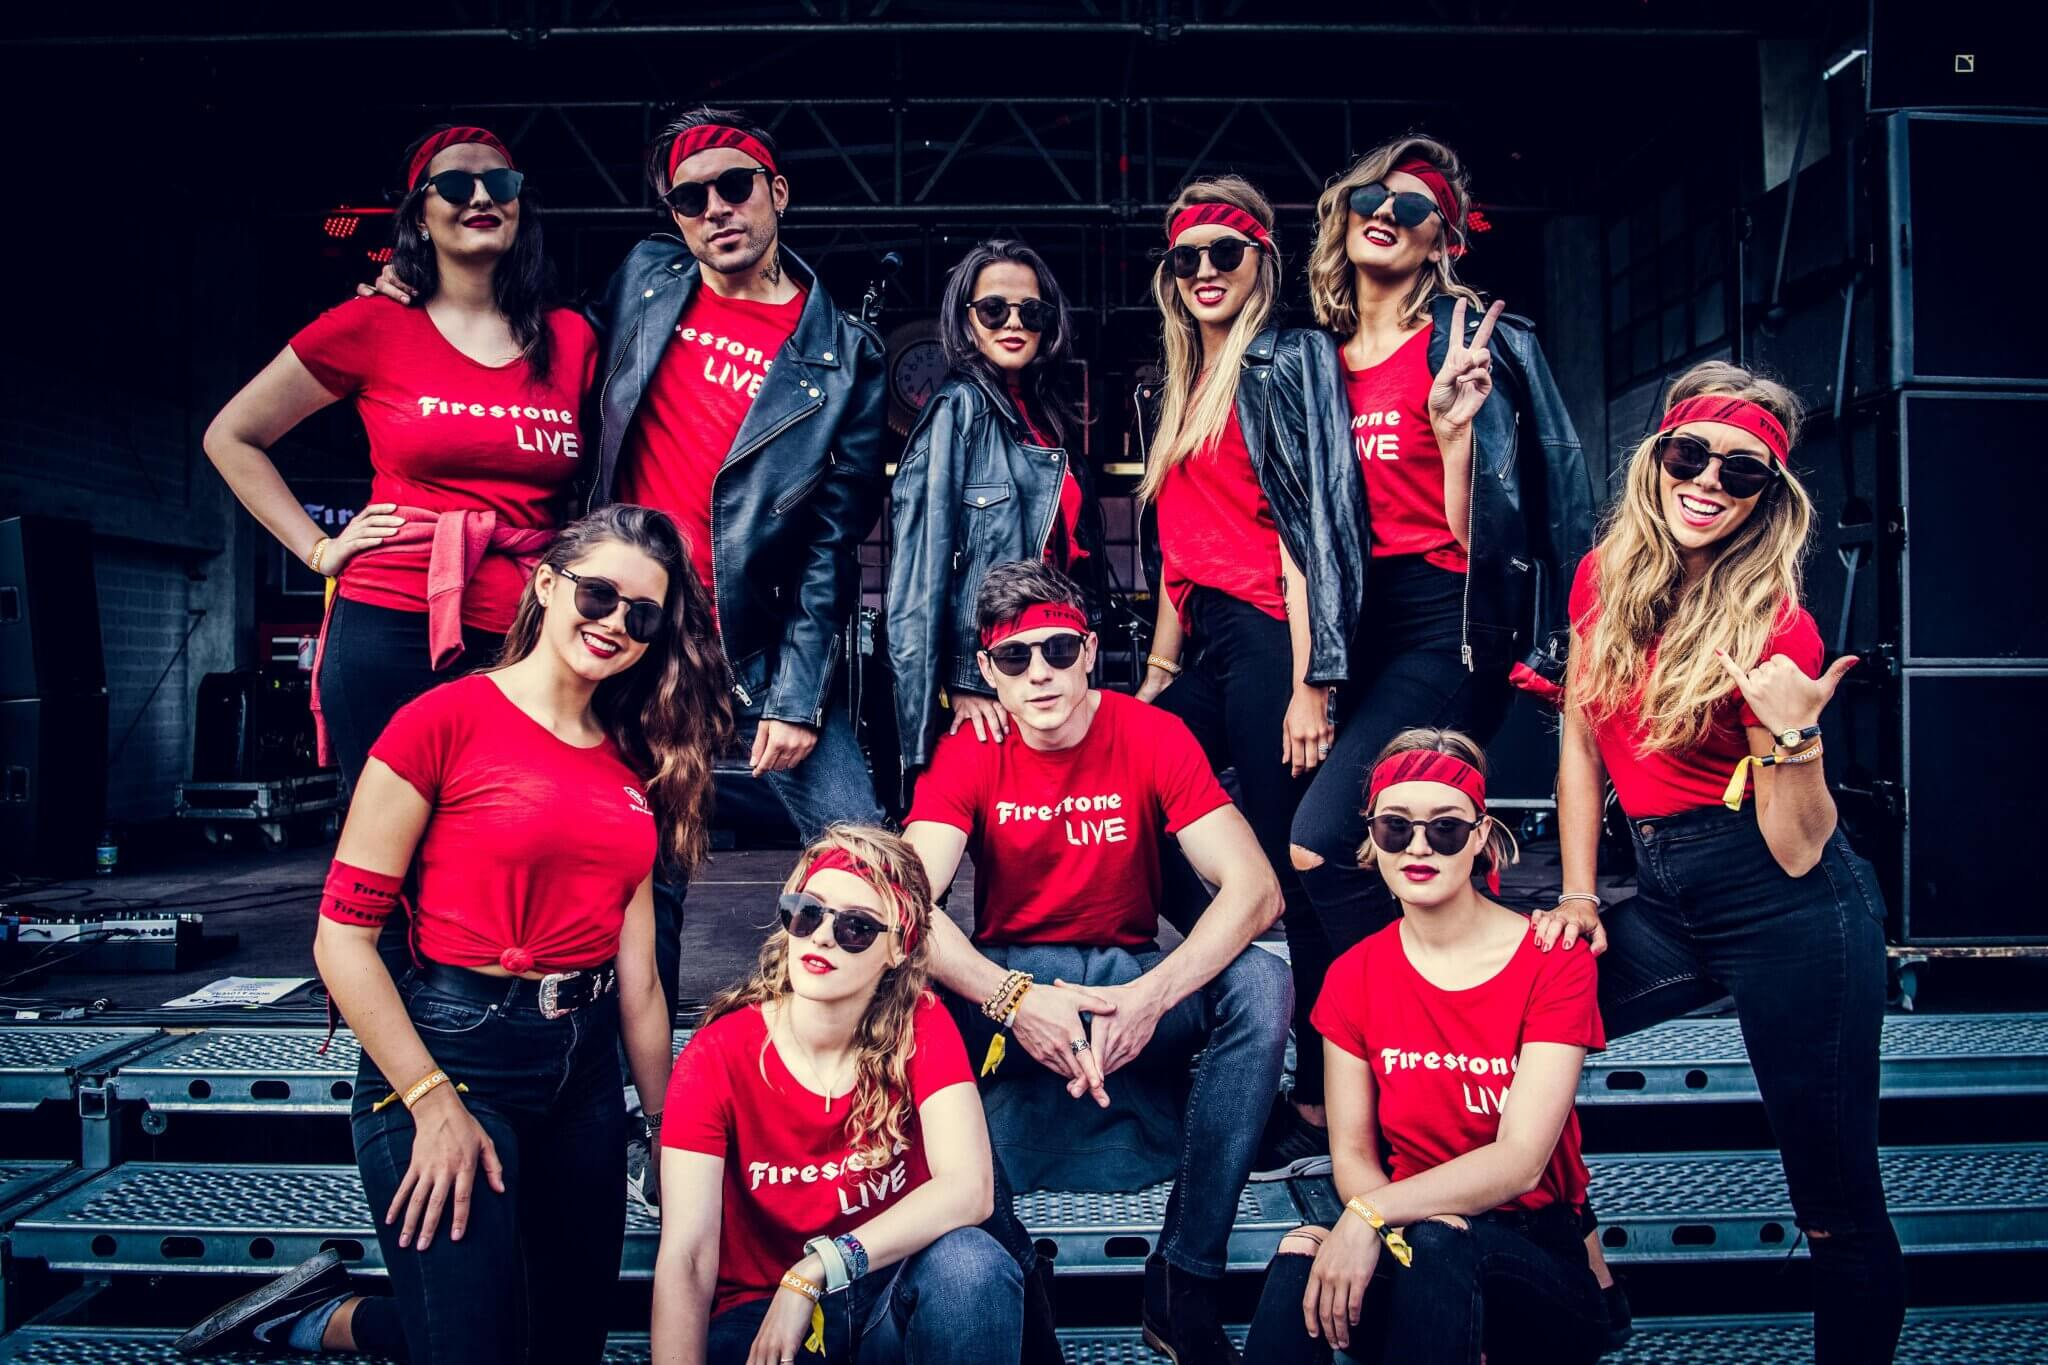 London Event Staff For Firestone